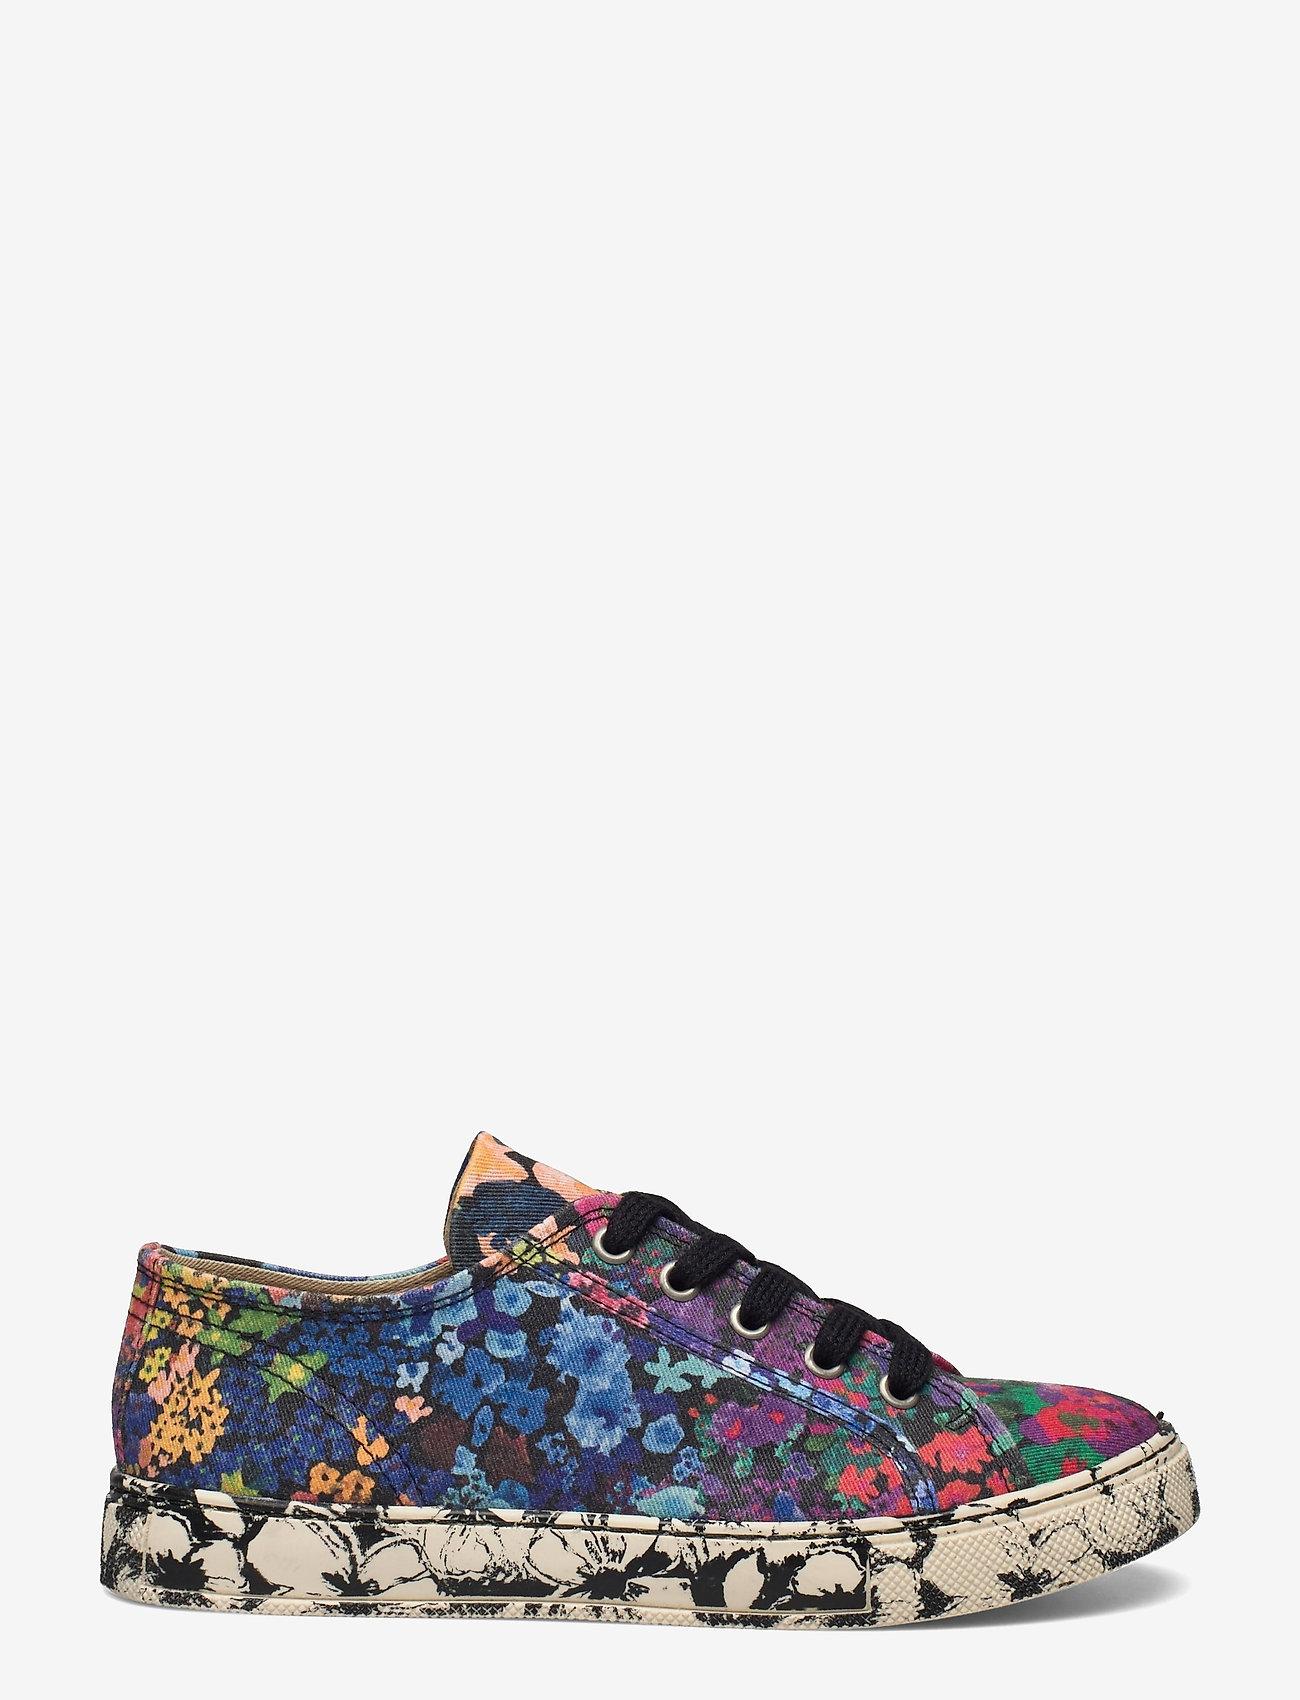 STINE GOYA - Eneko, 1192 Cotton Canvas Sneakers - lage sneakers - 60s allover - 1